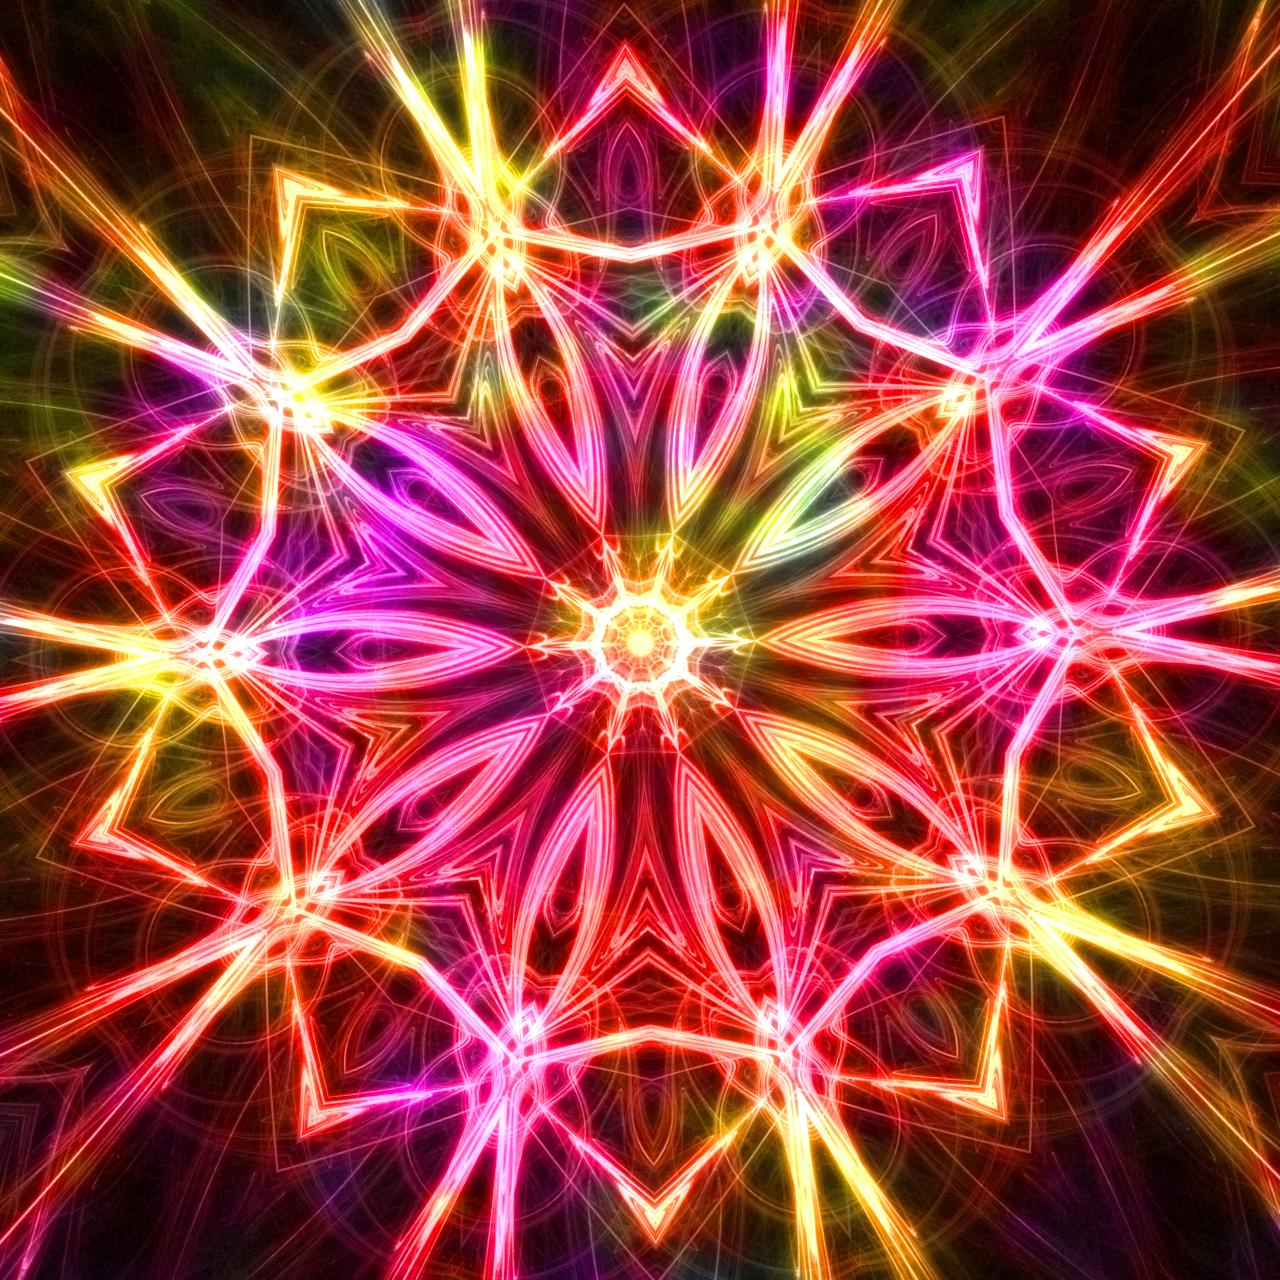 Kaleidoscope 6 by huntercobb